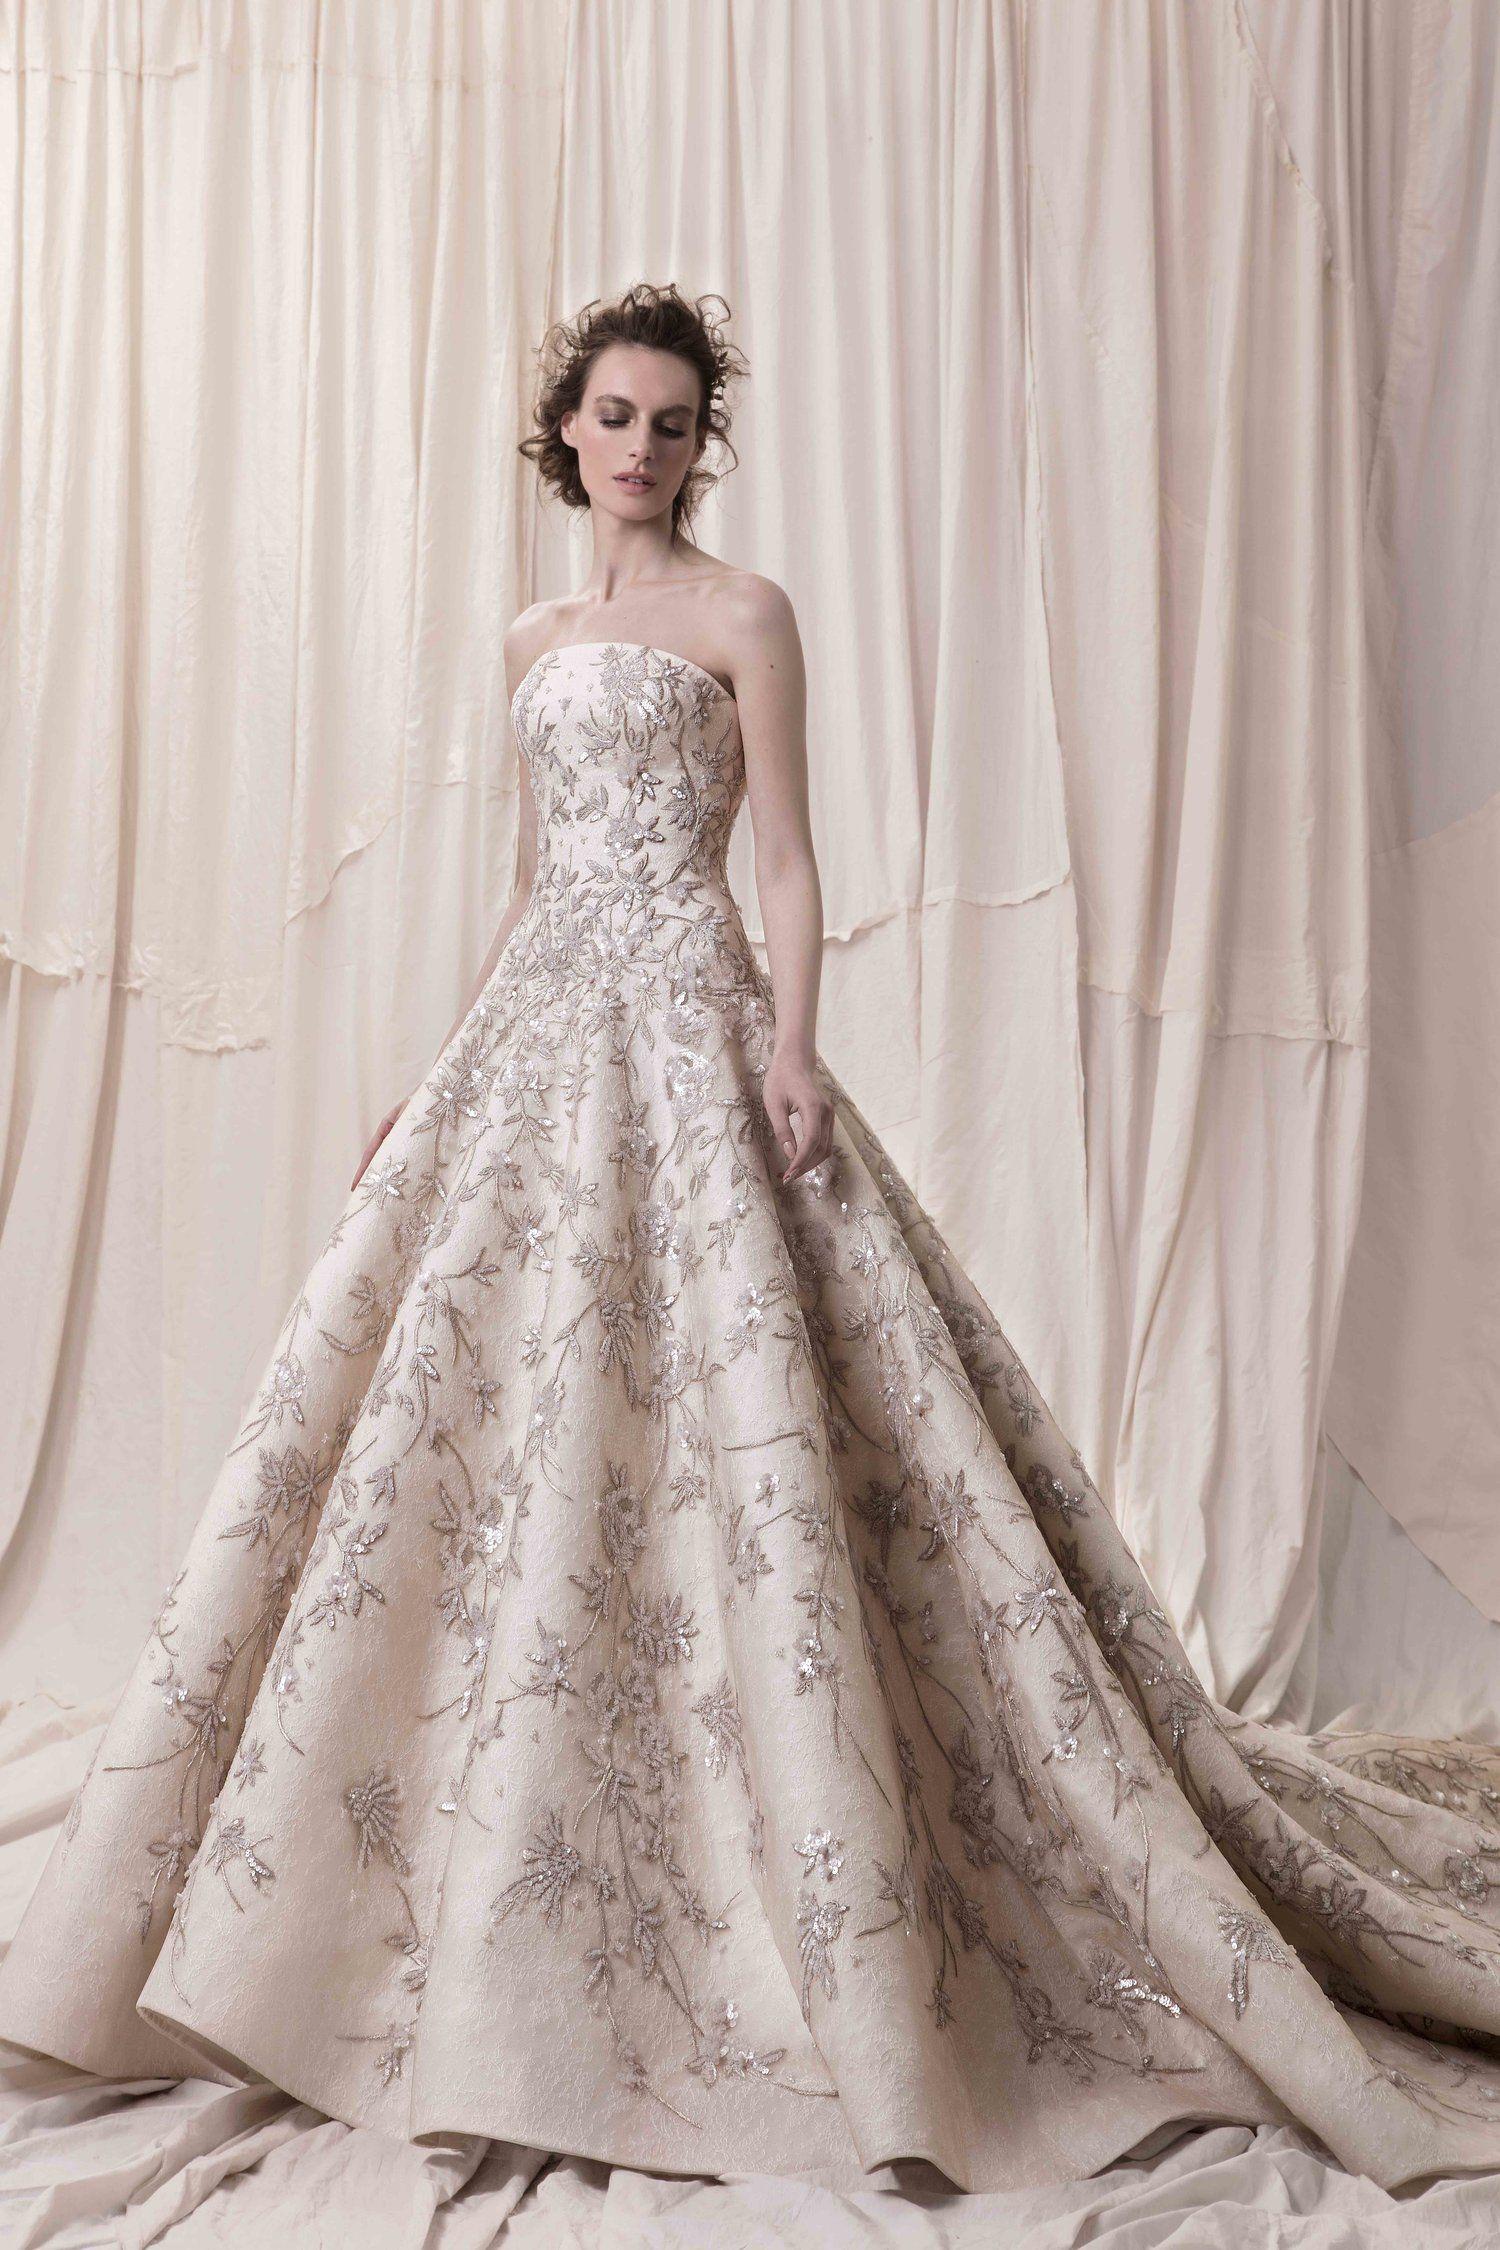 Pin by liudmila on mila pinterest wedding dress weddings and